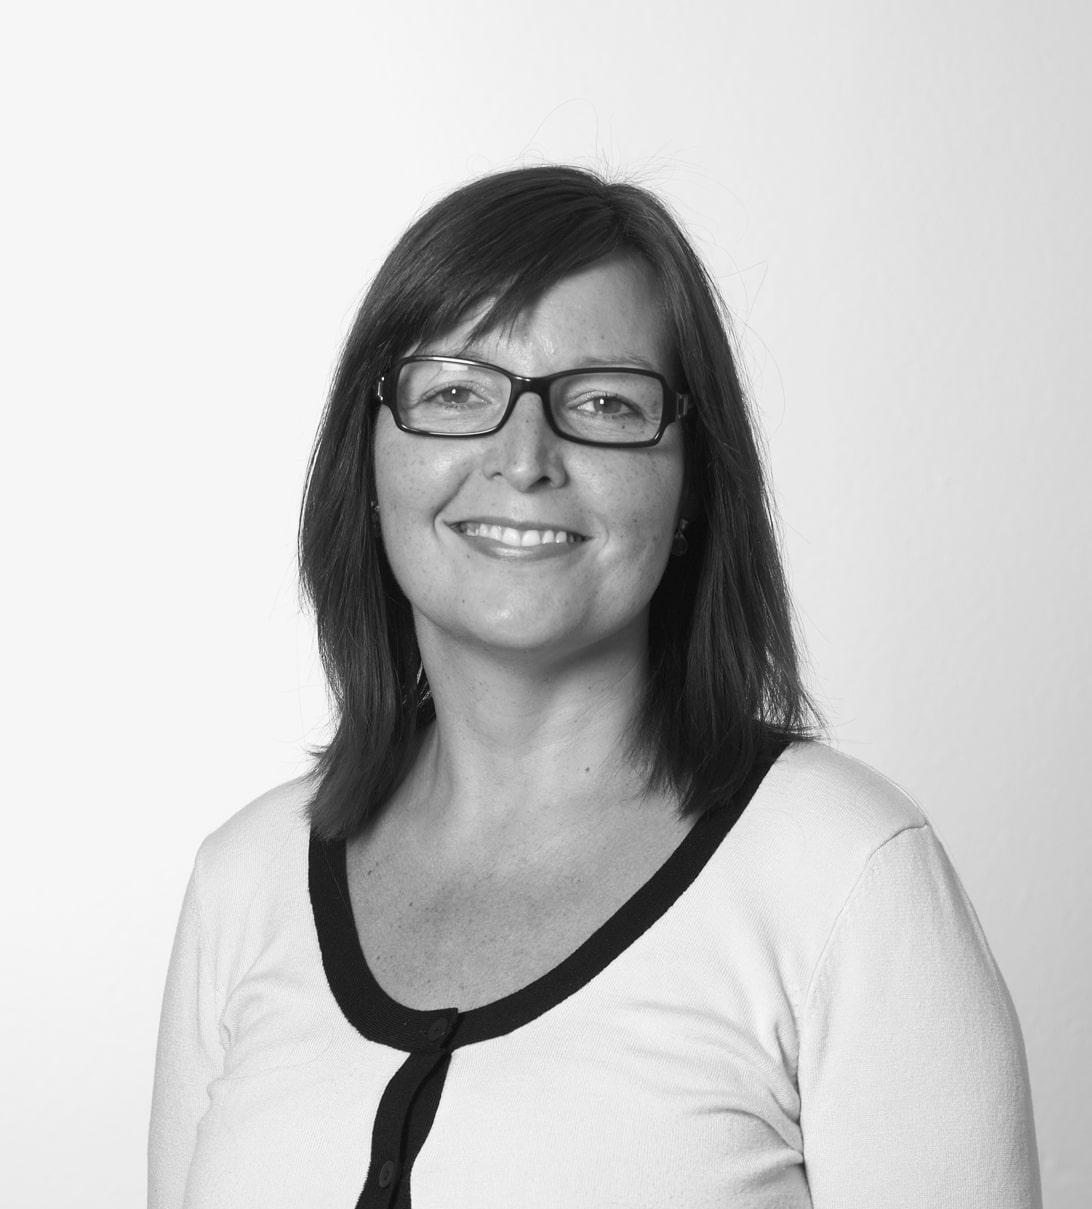 Johanna Rubendahl Few For Executive Women